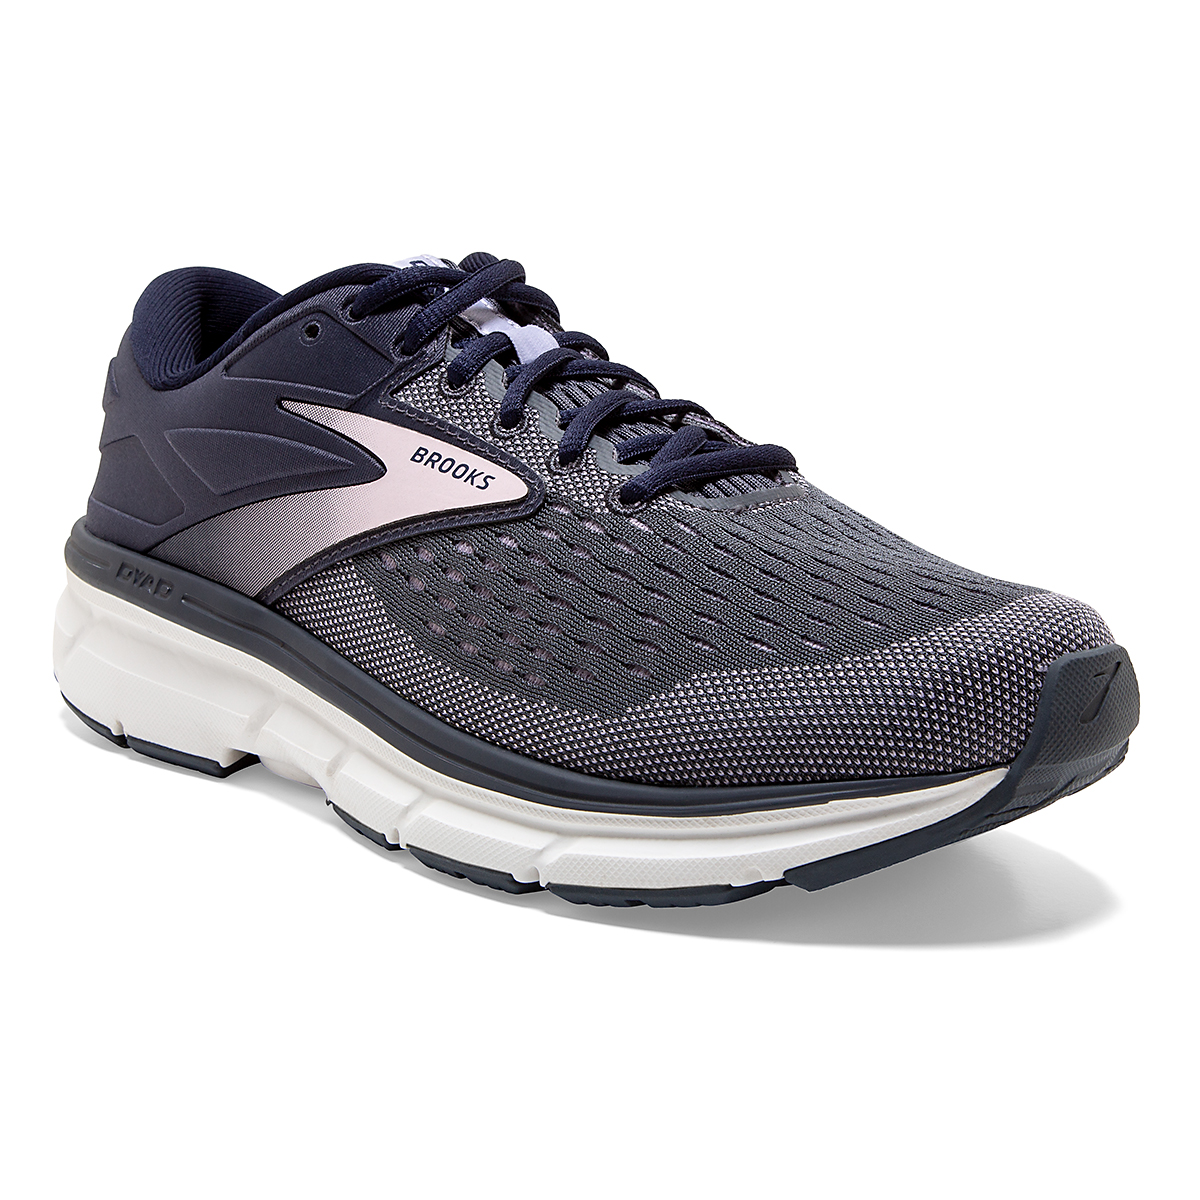 Women's Brooks Dyad 11 Running Shoe - Color: Ombre/Primrose  - Size: 6 - Width: Regular, Ombre/Primrose, large, image 3